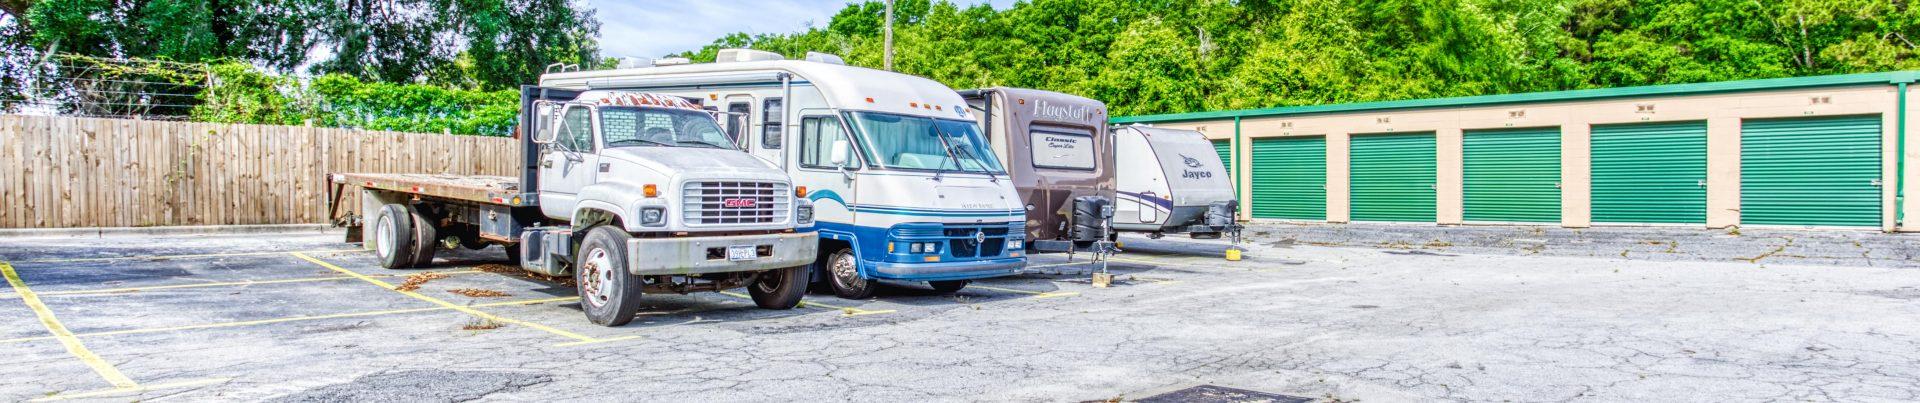 Outdoor Parking in in Savannah GA